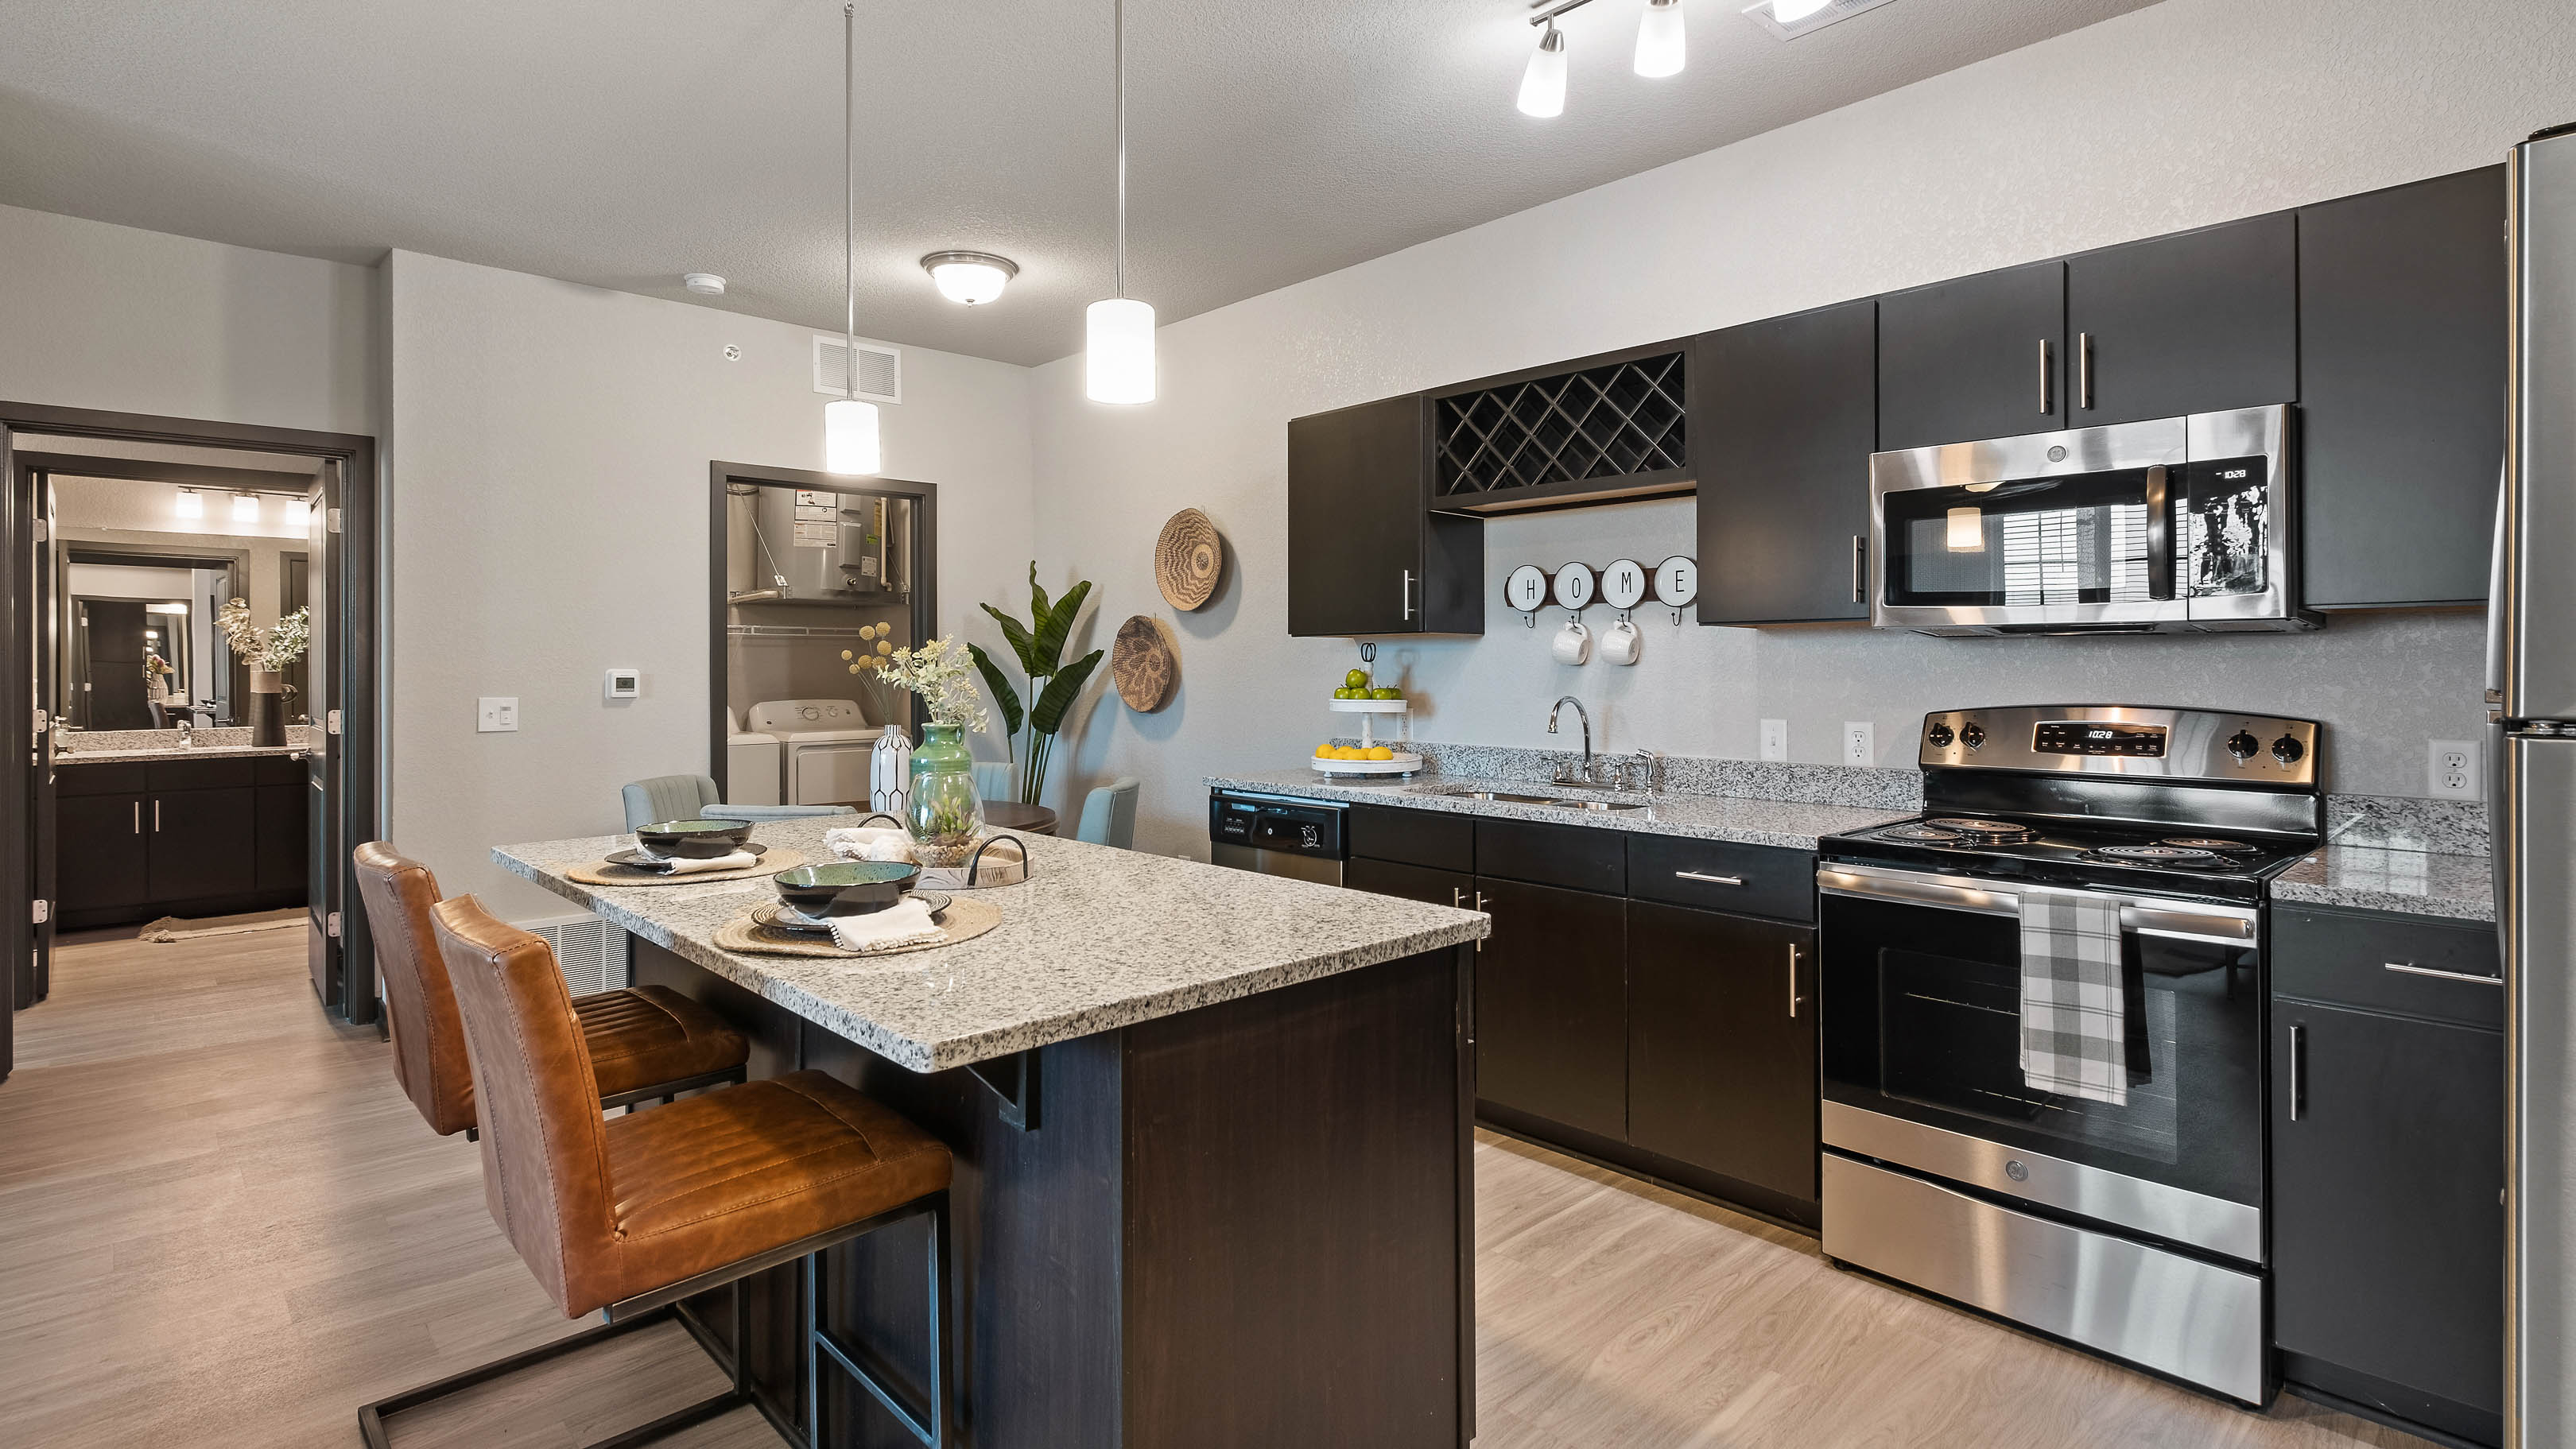 Kitchen at Springs at Deer Valley in Pheonix, AZ